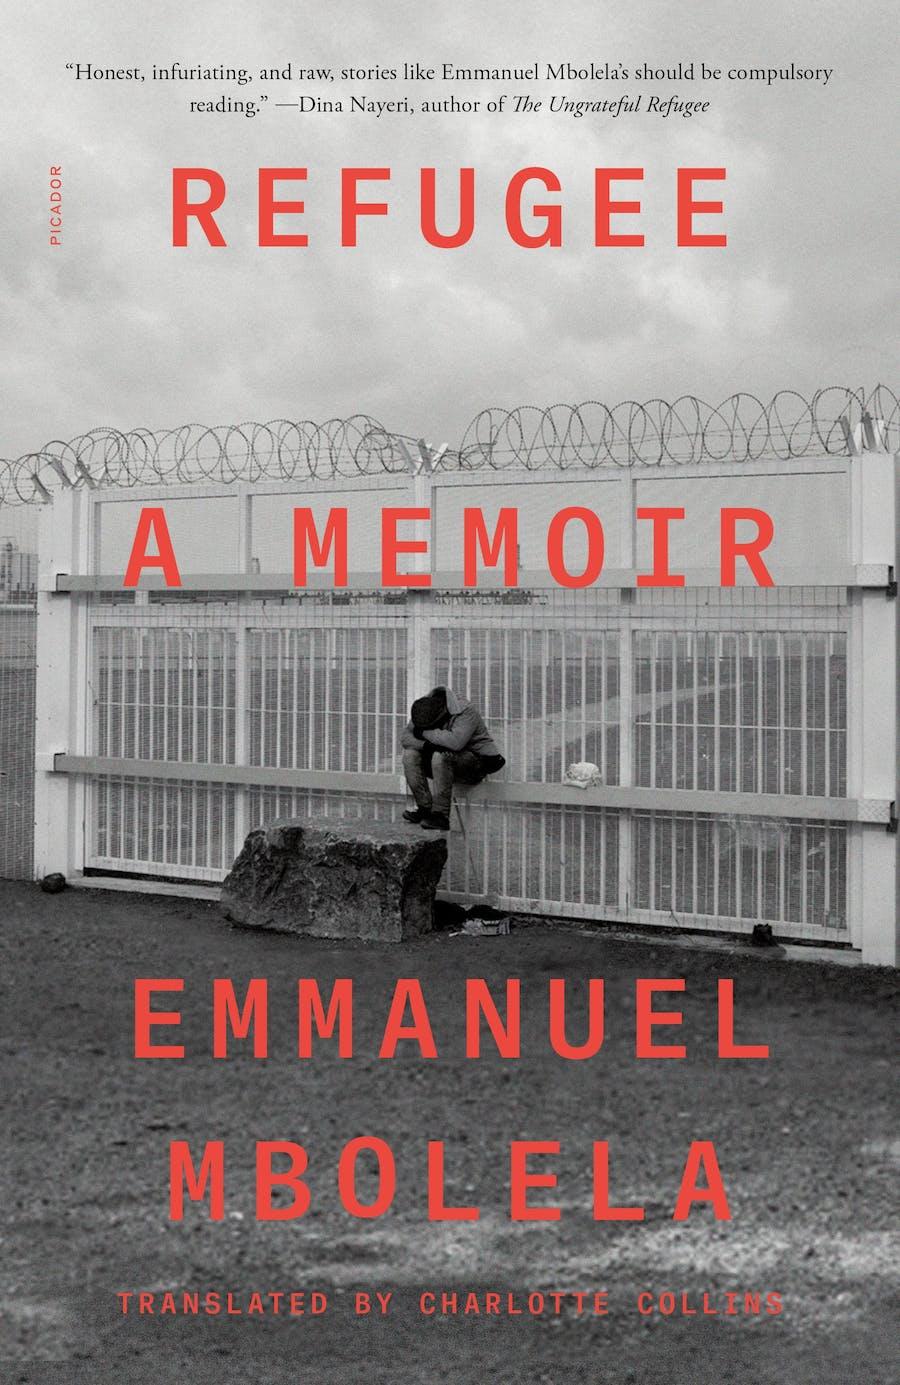 Refugee by  Emmanuel Mbolela; Translated by Charlotte Collins from the German translation by Alexander Behr